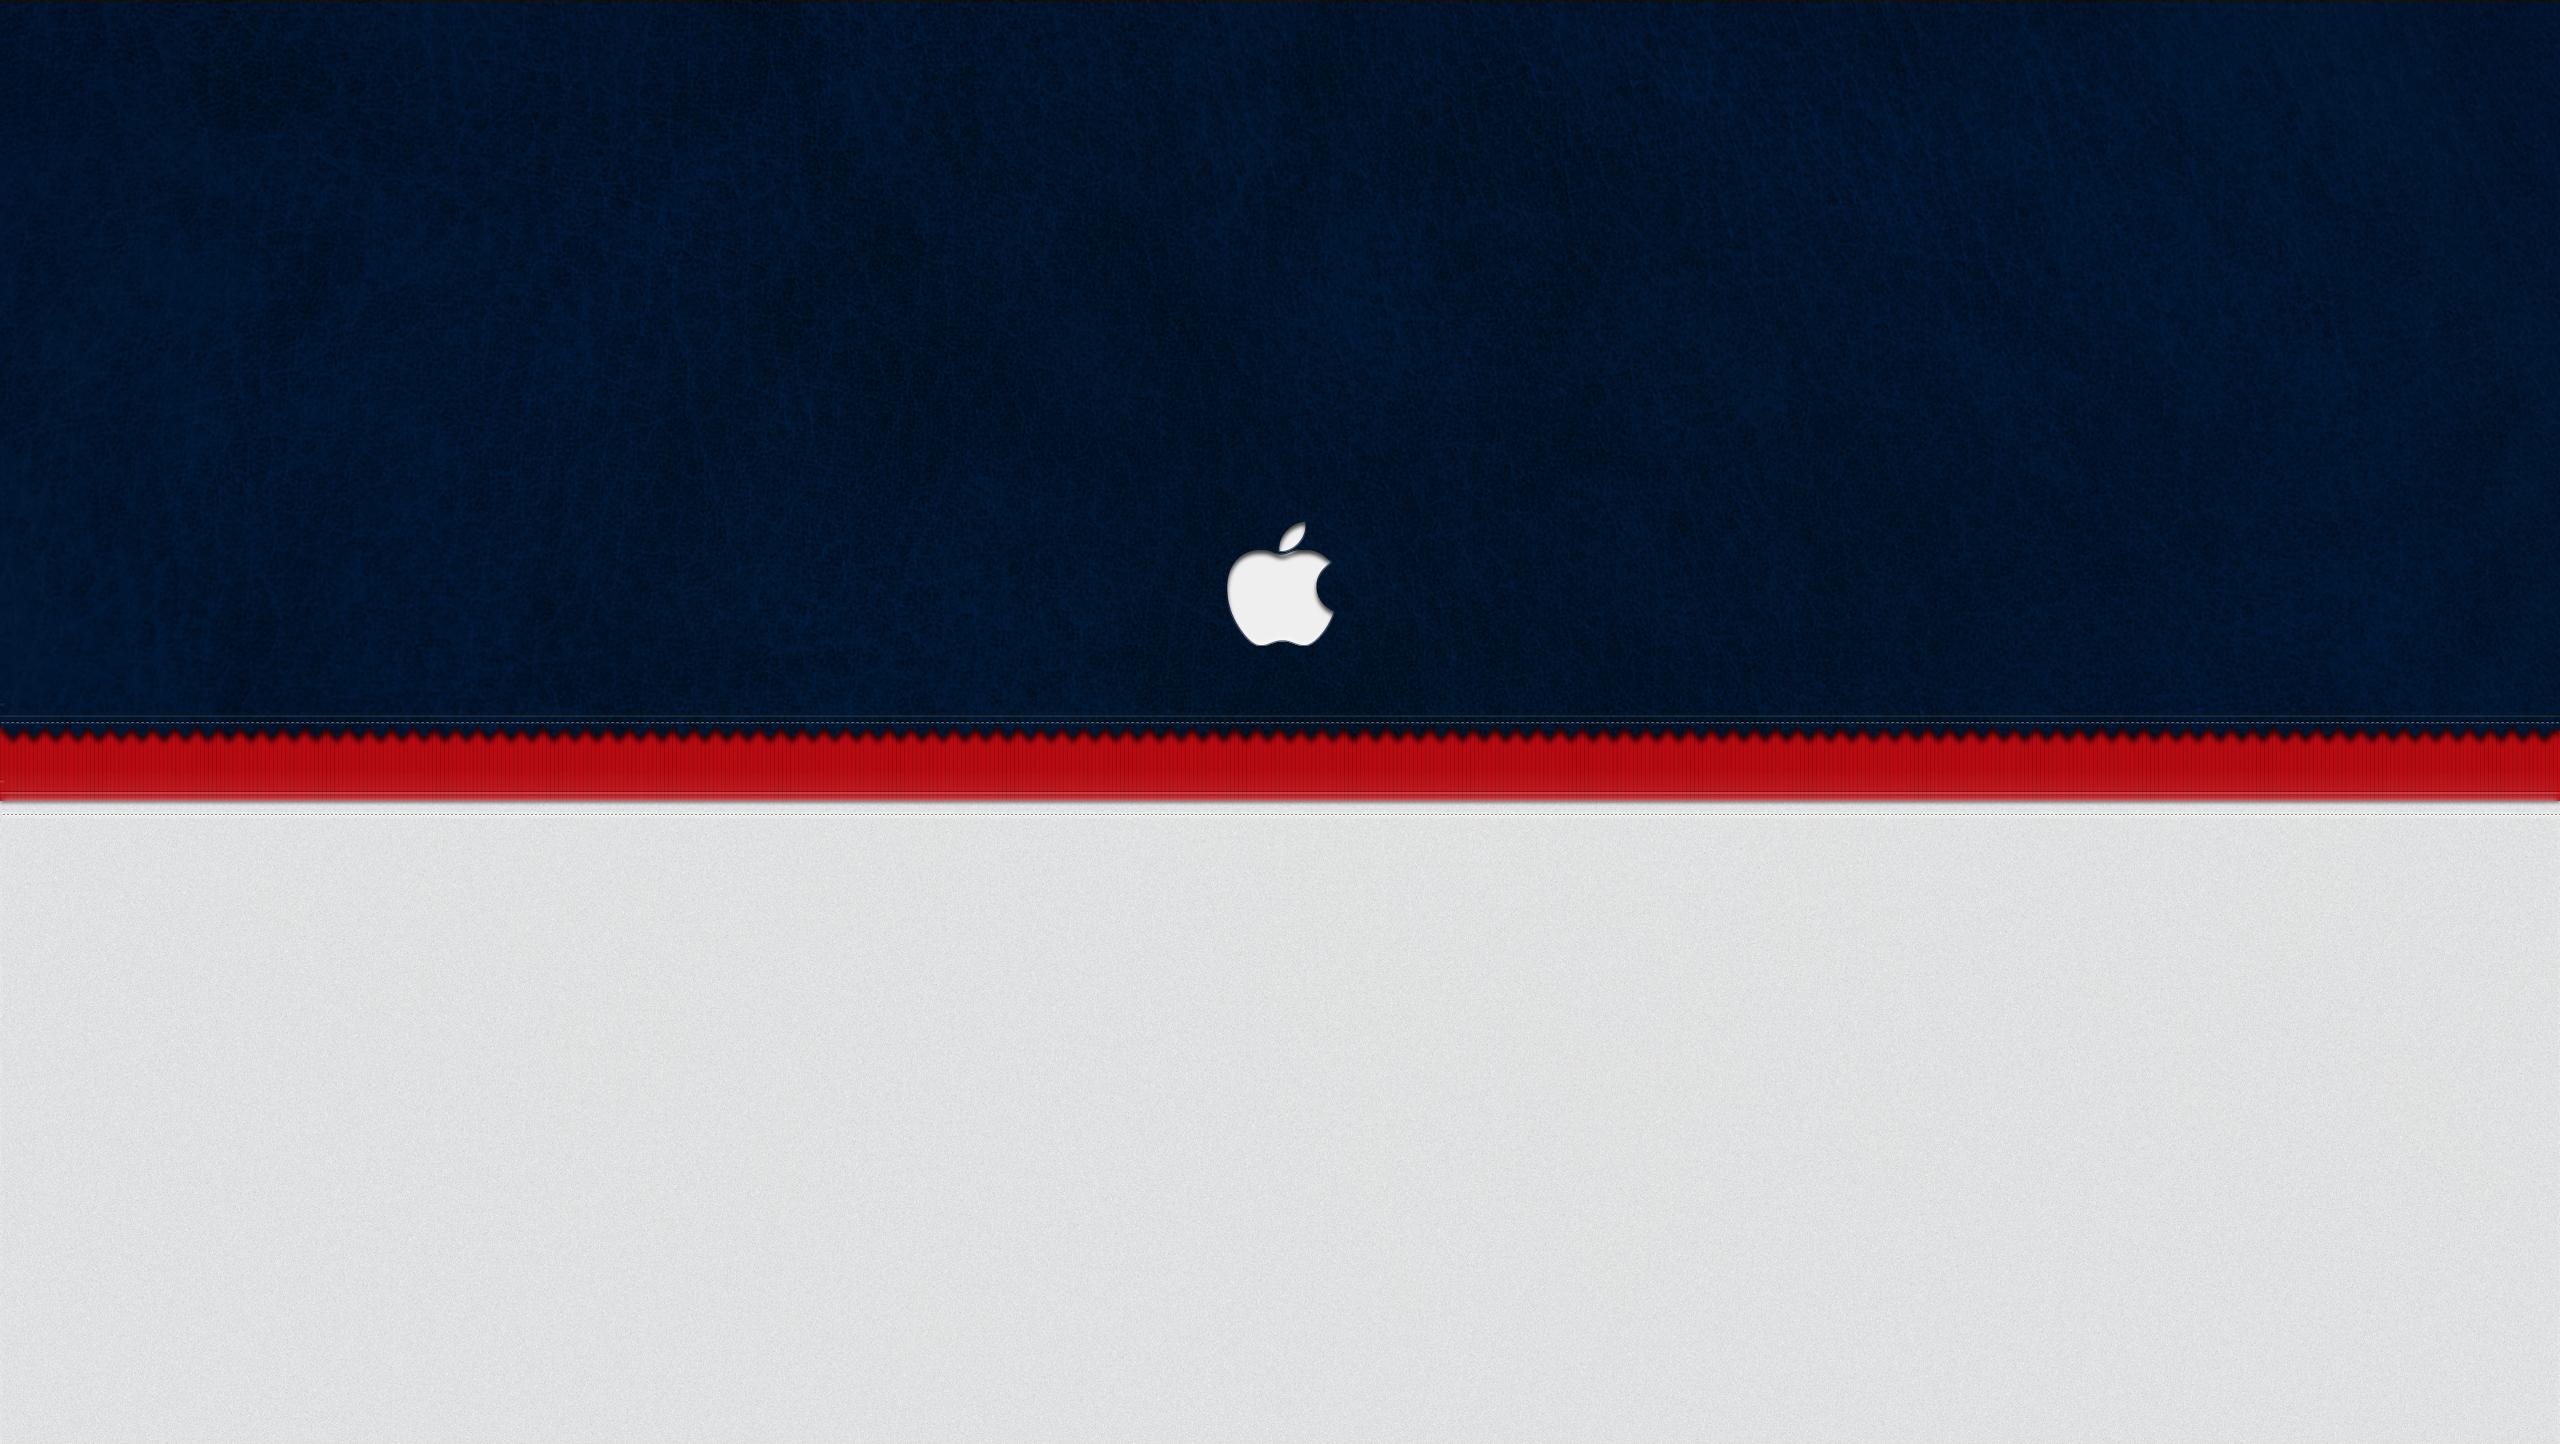 Mac rwb by monkeymagico